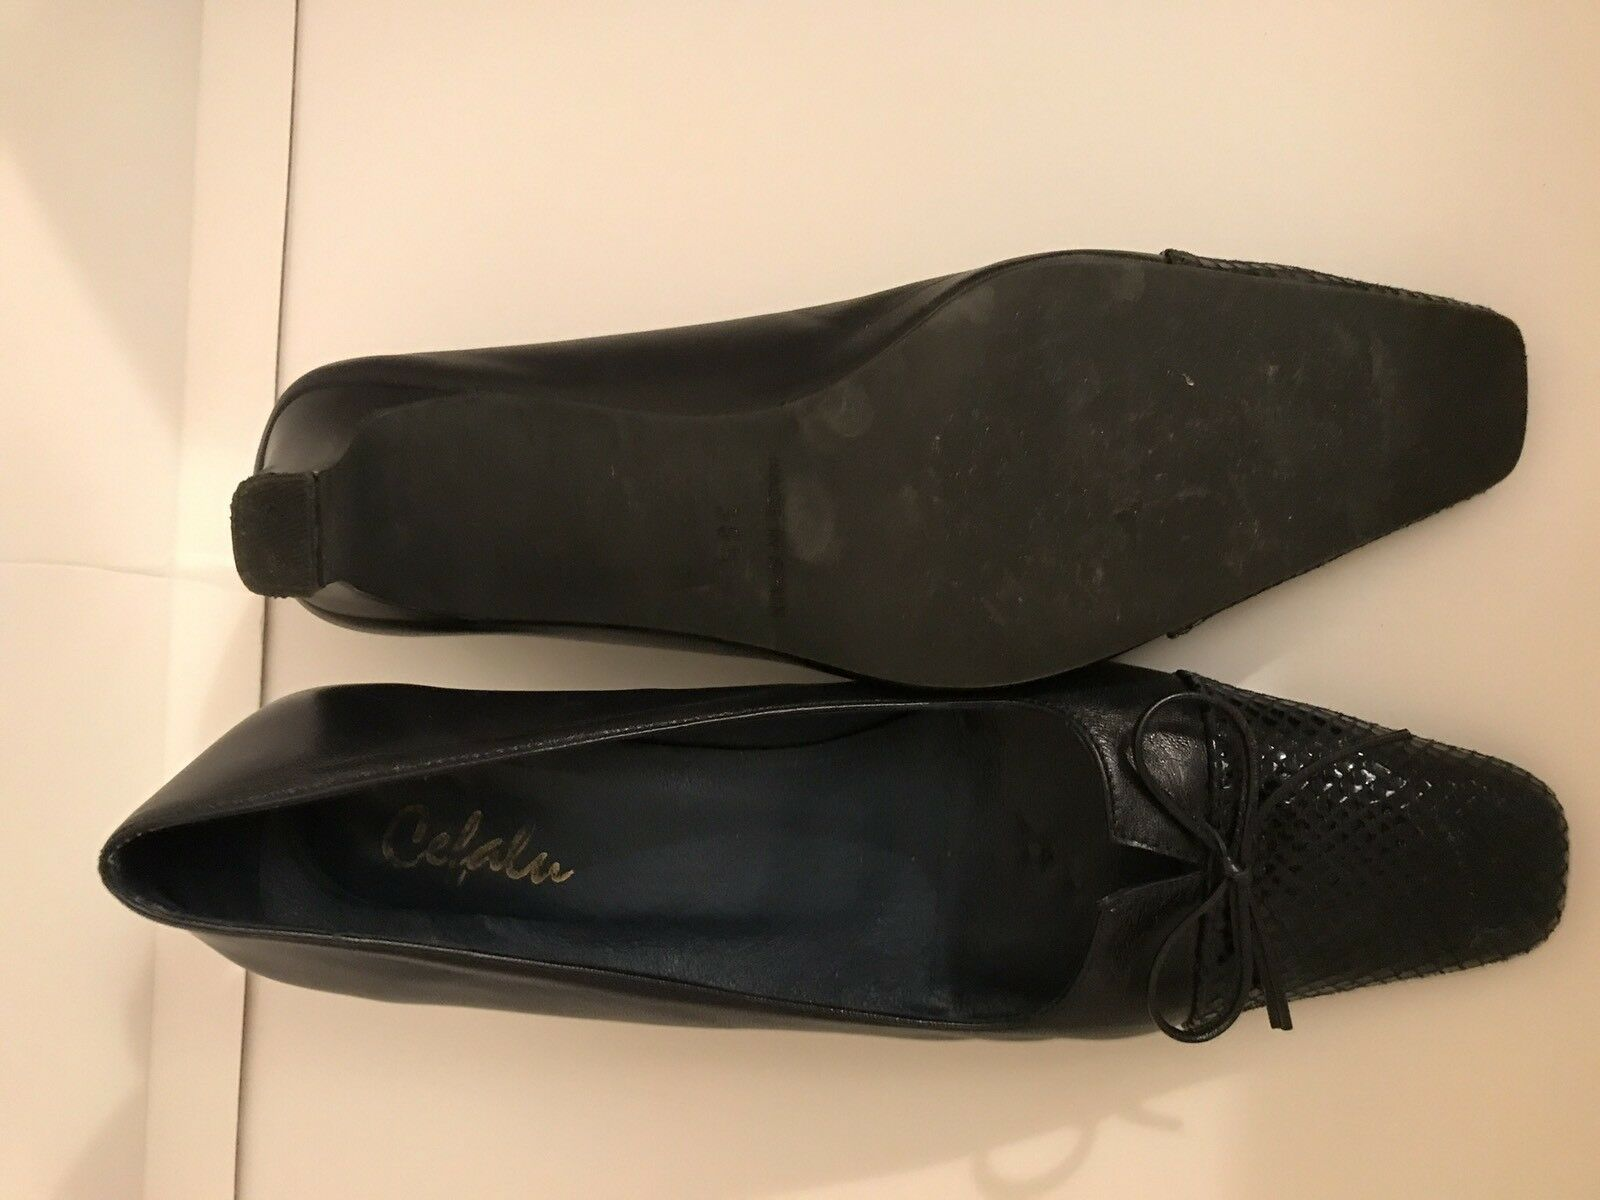 CEFALU Elpe Navy Blau Leder Court Schuhes UK5.5 EU38.5 US8 Ex Condition